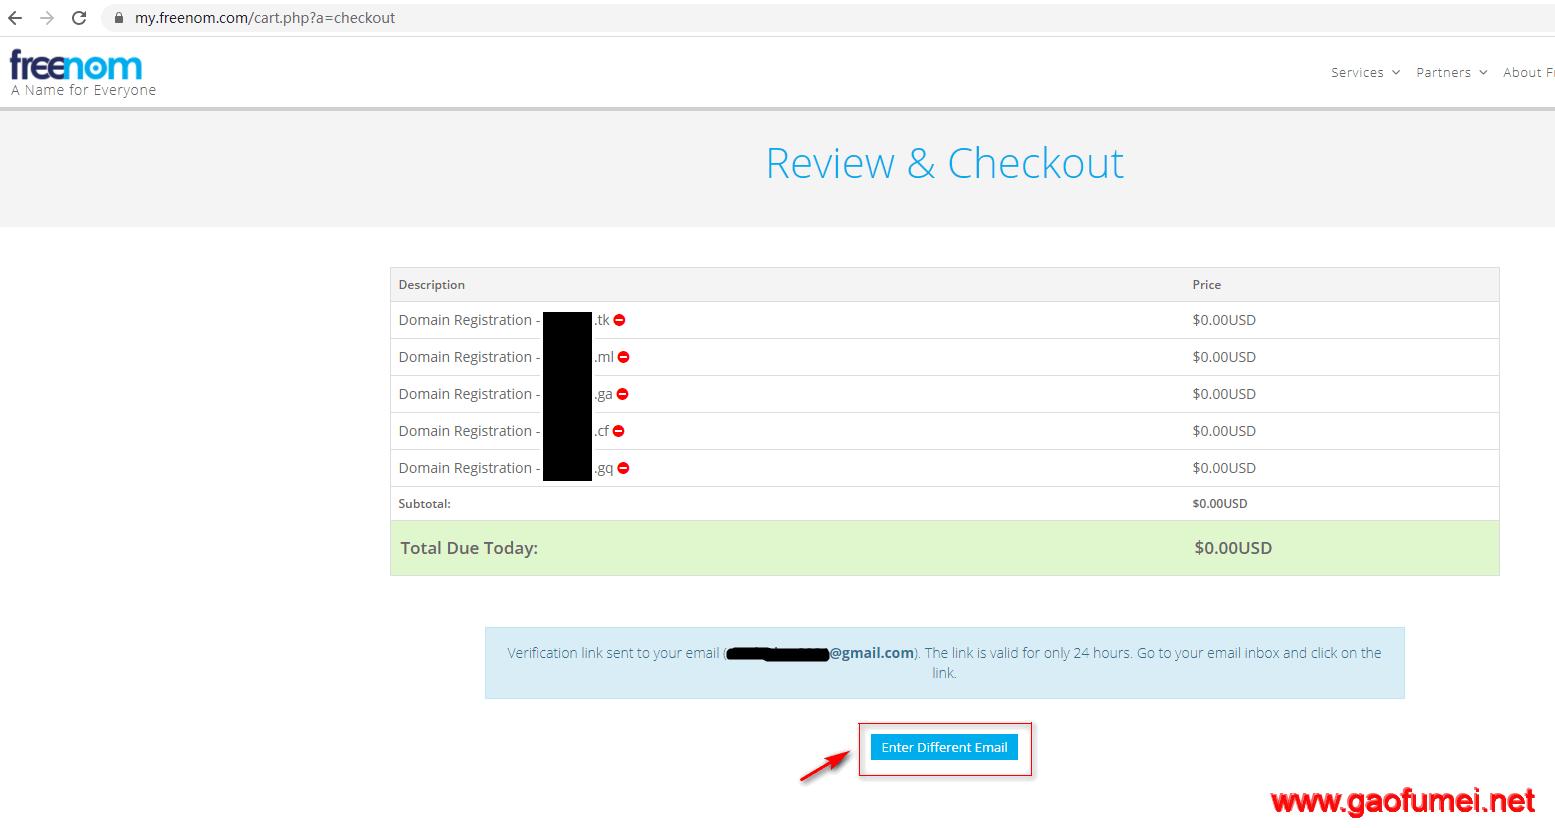 freenom用谷歌帐号来登陆,直接提示:Your social login could not be deturemined无法确定您的社交登录名.)的终级解决办法,亲测有效。 网络问题 第5张-泥人传说